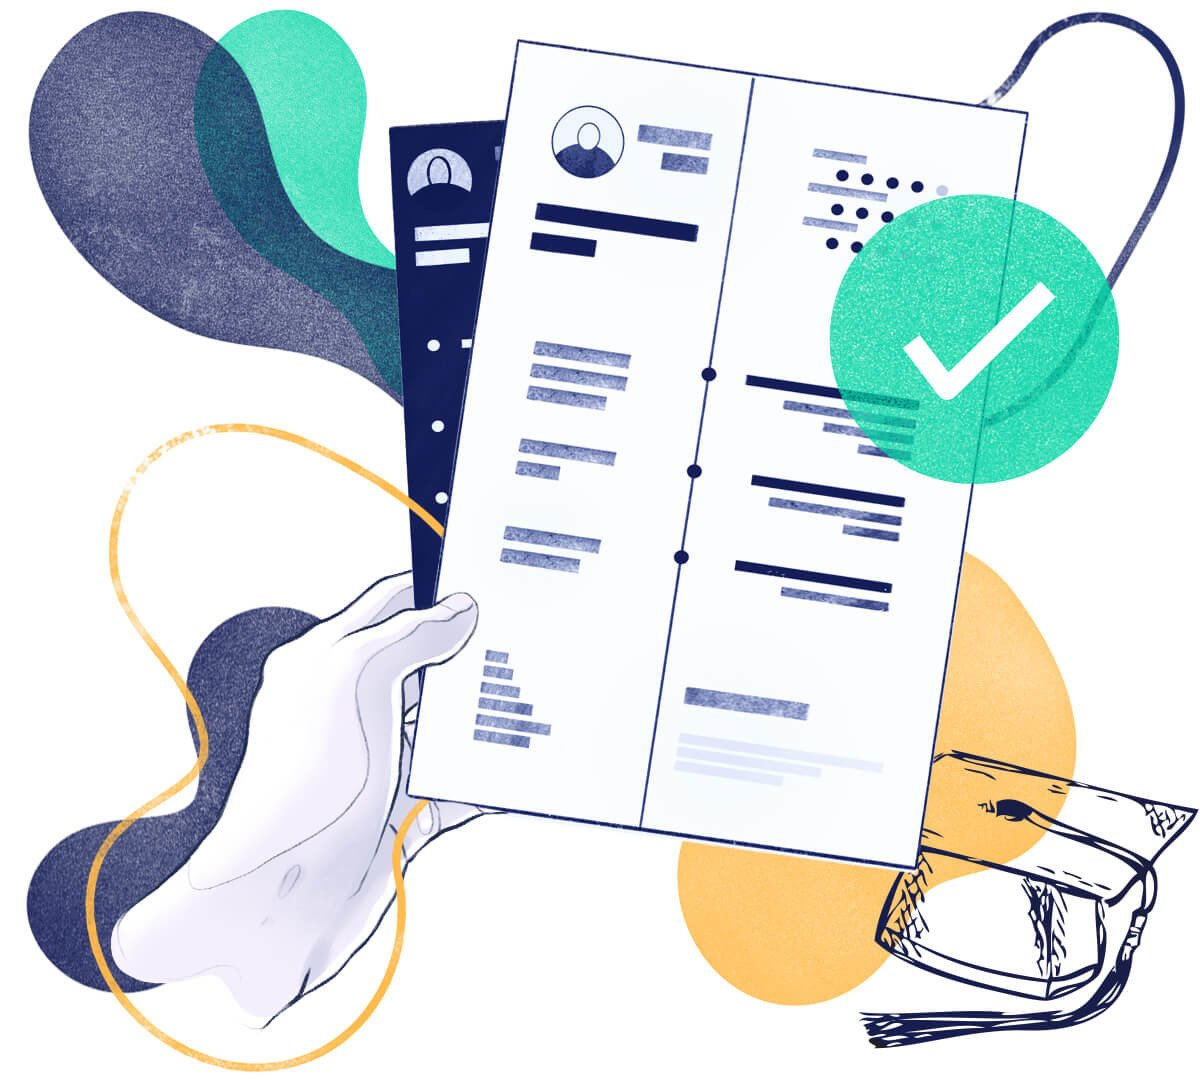 University Student CV Template—20+ Writing Tips & Samples